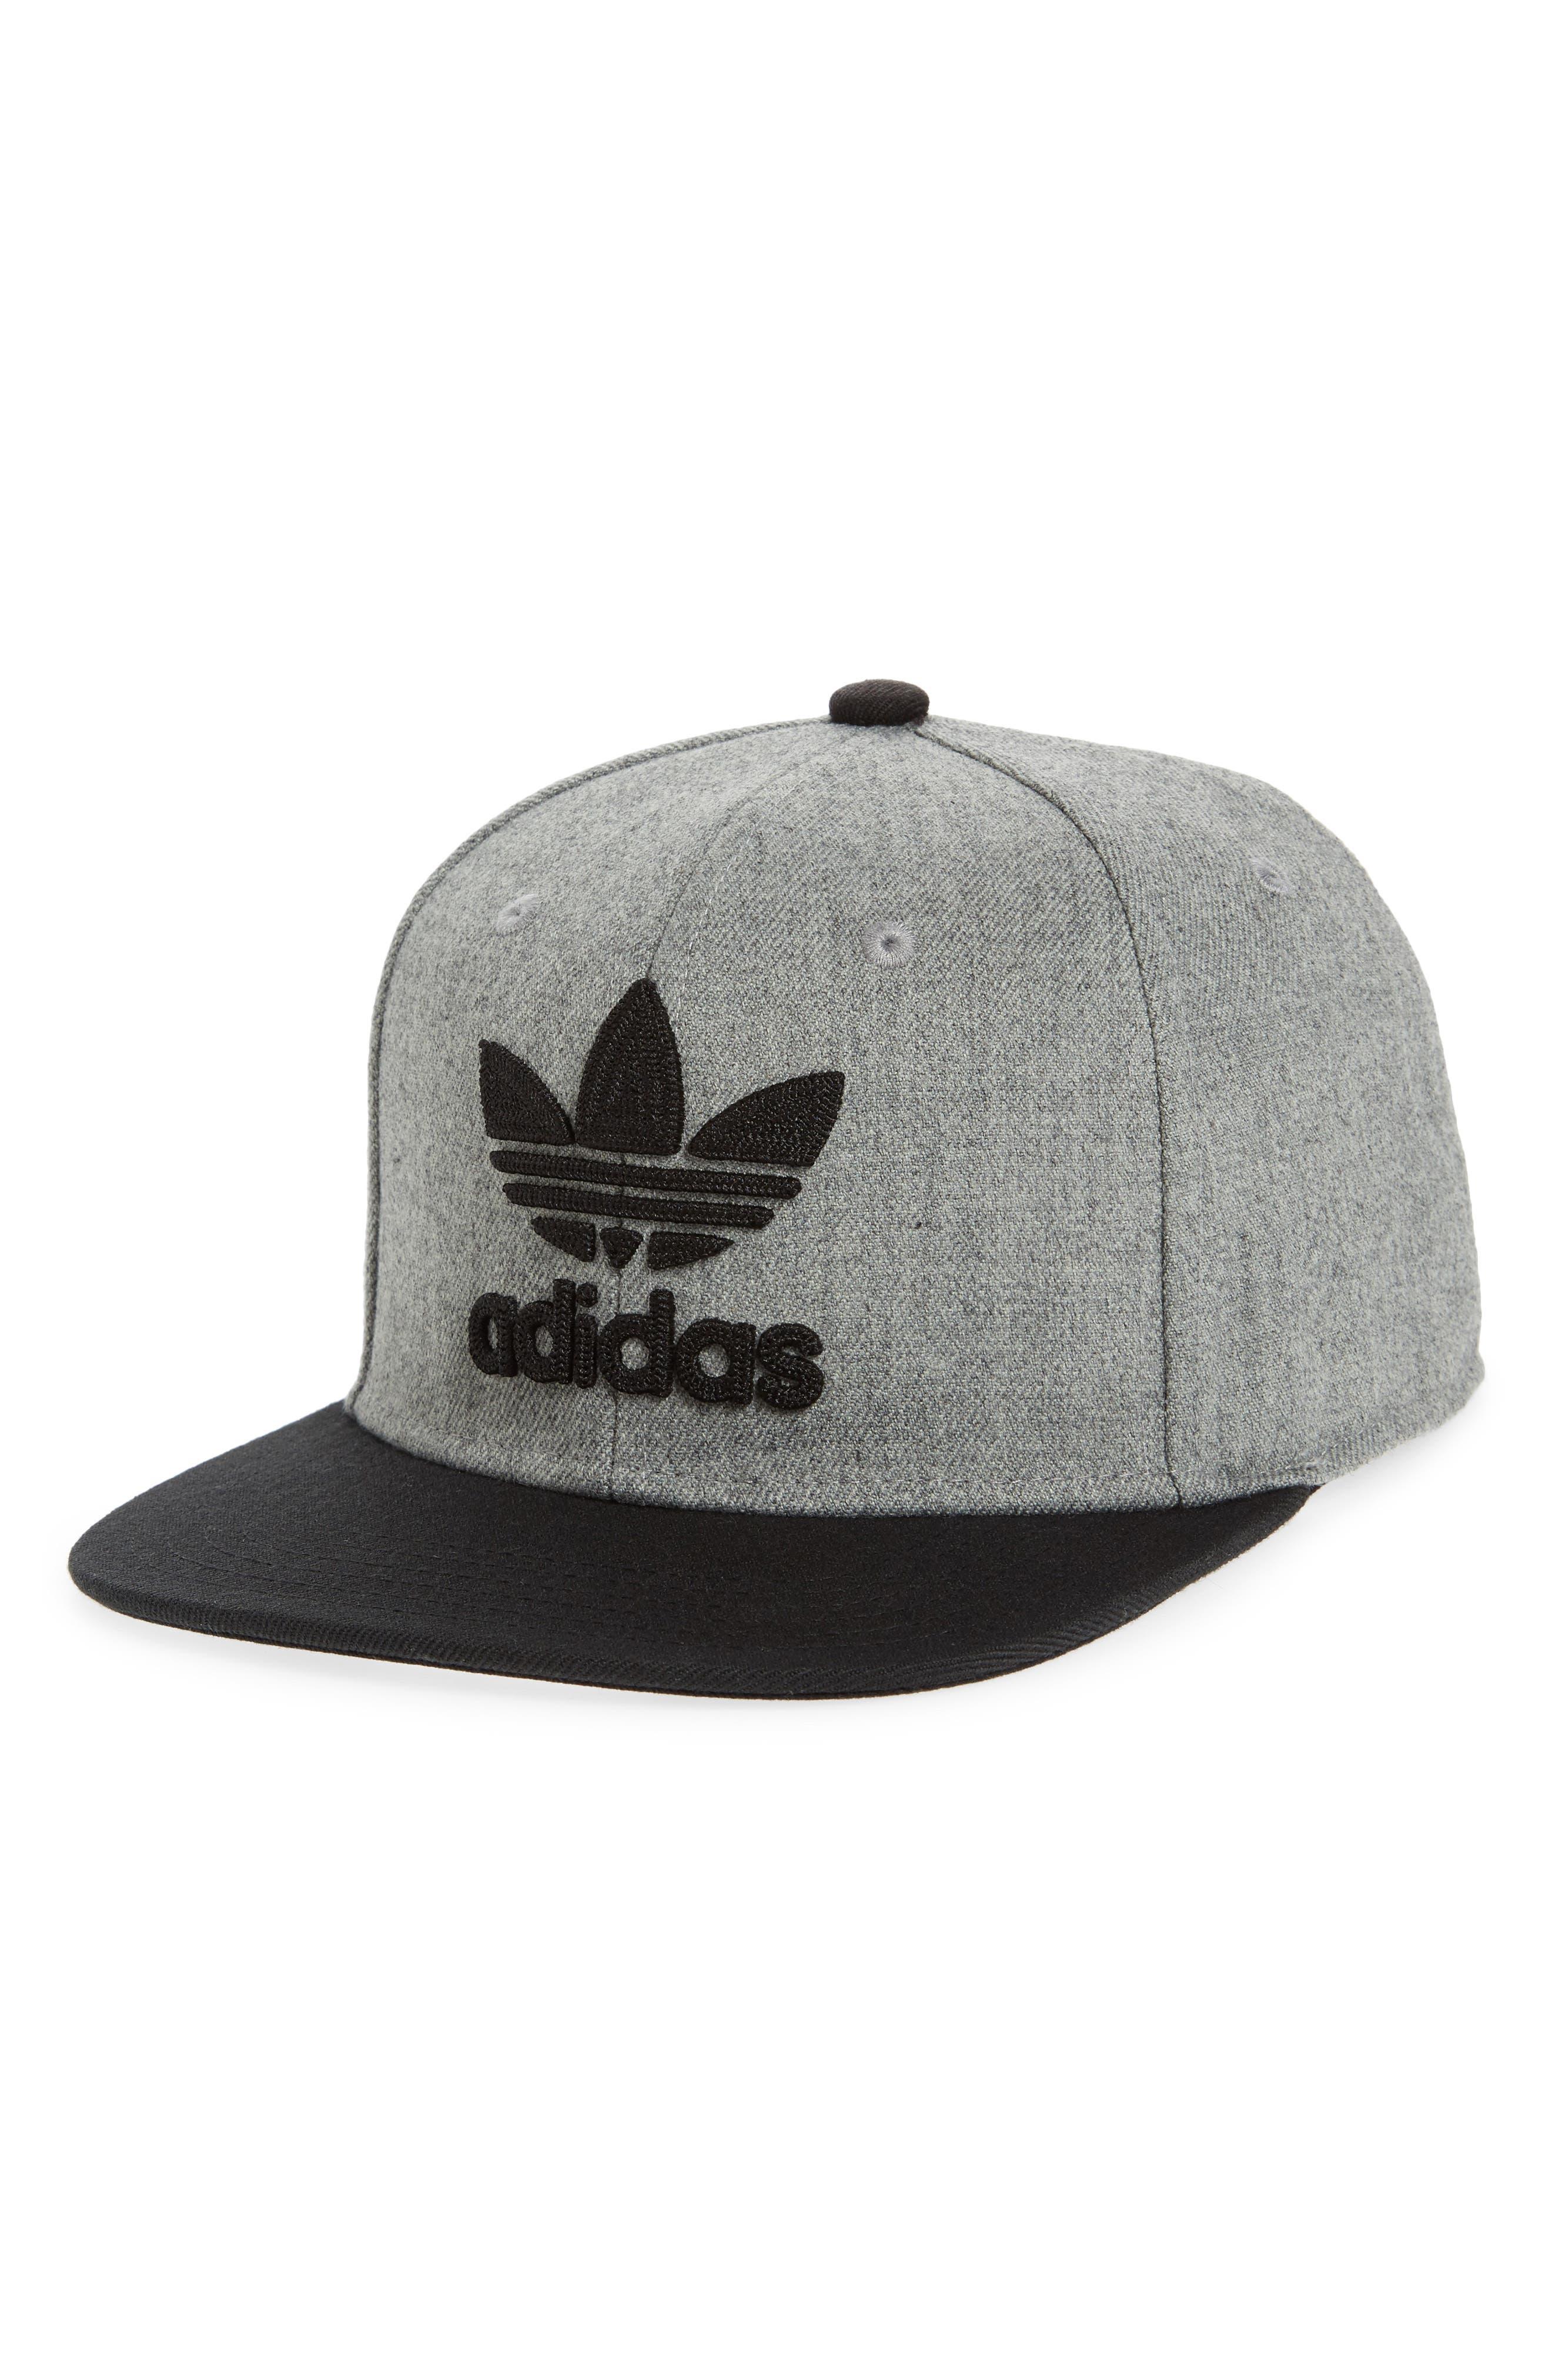 Alternate Image 1 Selected - adidas Originals Trefoil Chain Snapback Baseball Cap